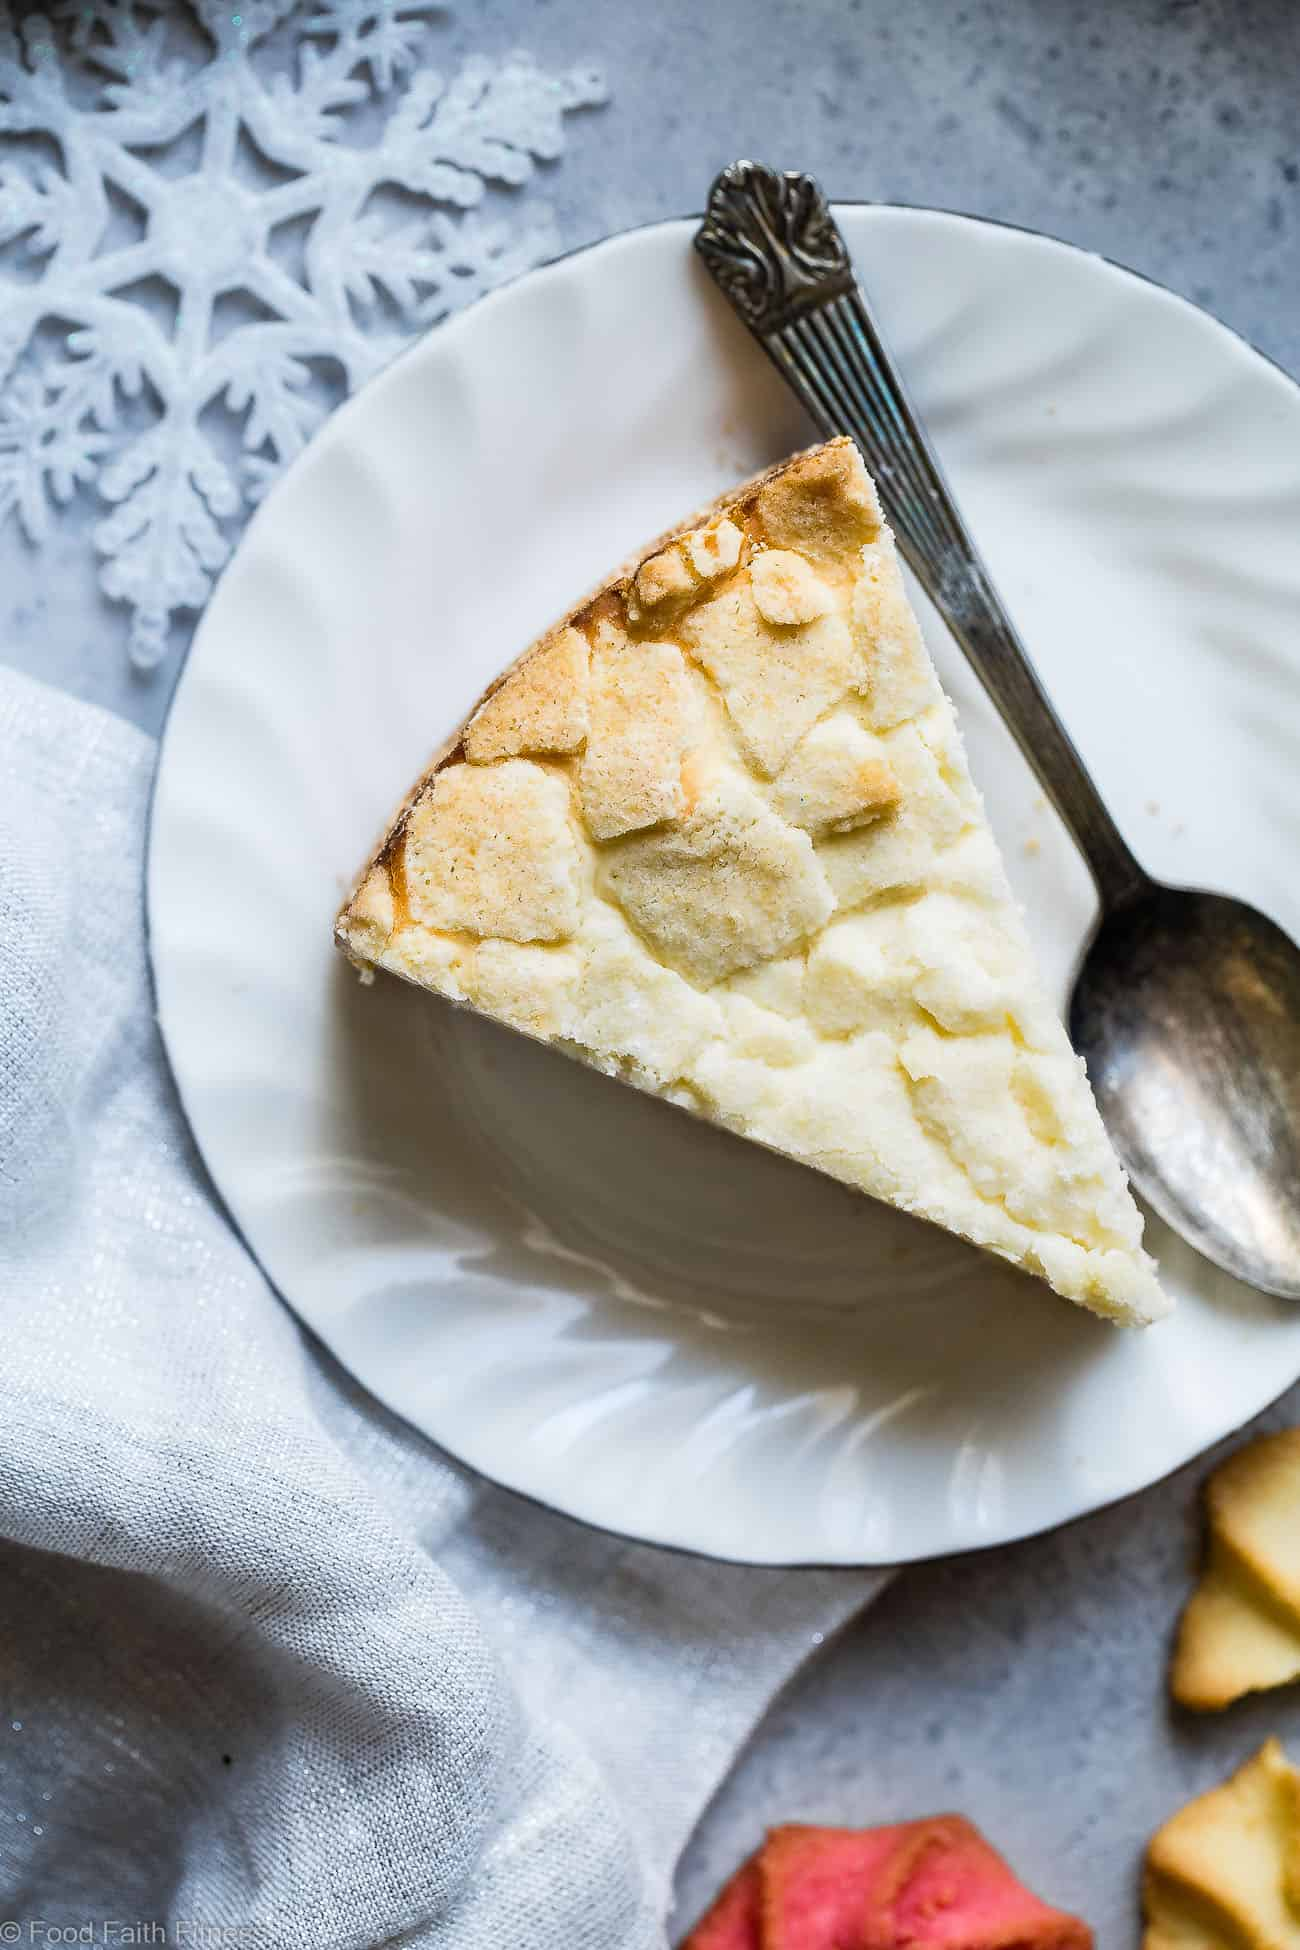 Sugar Free Greek Yogurt Gluten Free Cheesecake -This gluten free cheesecake is an easy dessert that combines 2 Holiday treats ! It's so creamy you won't believe it's healthy, sugar free and only 235 calories! | Foodfaithfitness.com | @FoodFaithFit